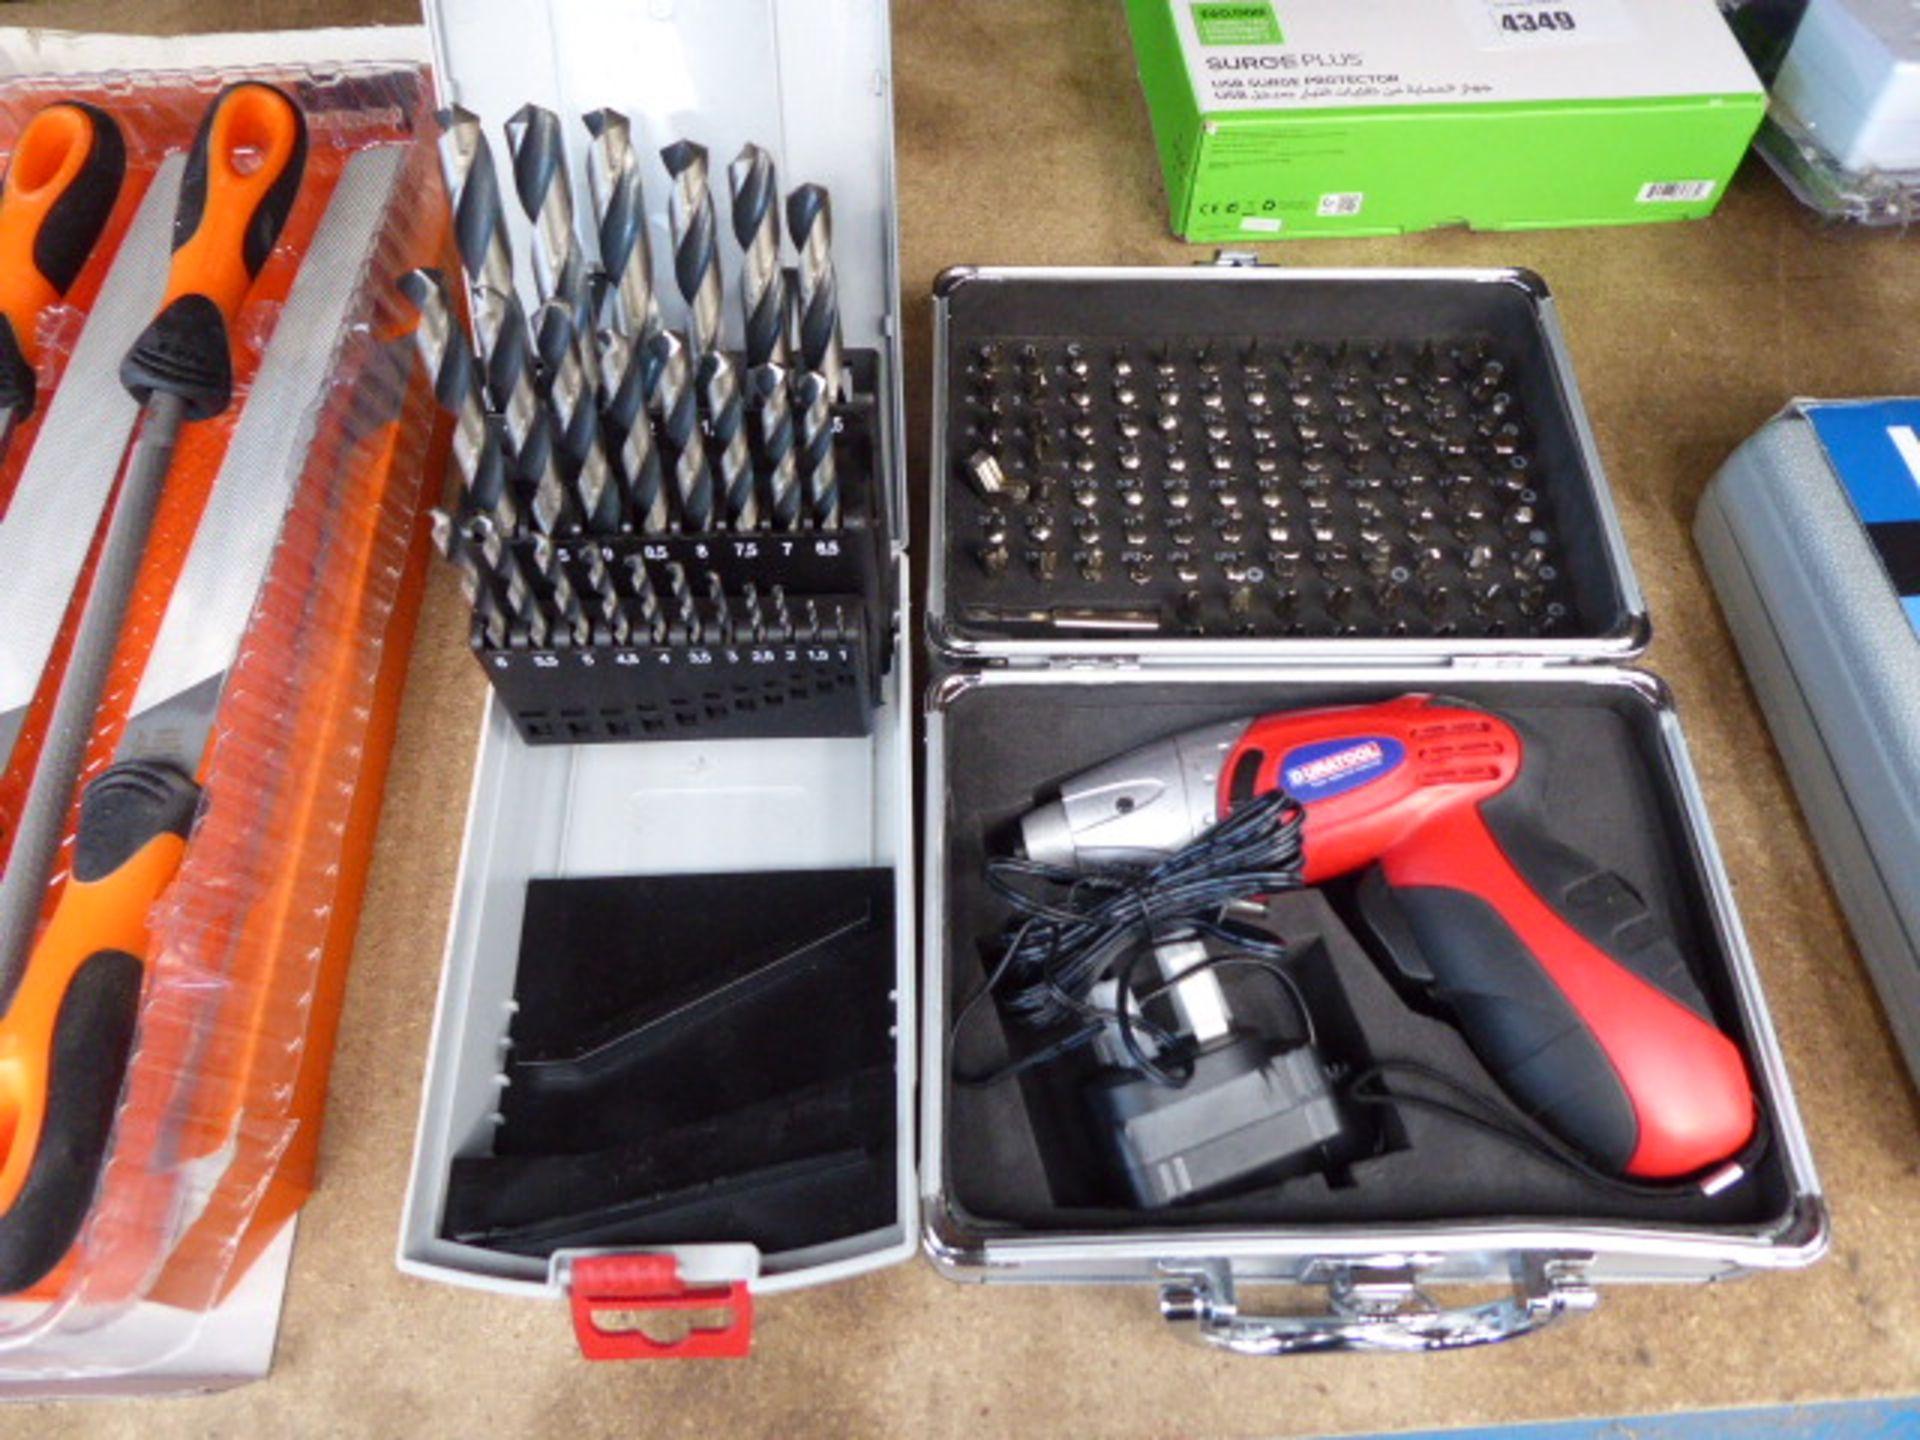 Duratool cordless mini screwdriver and a drill bit set